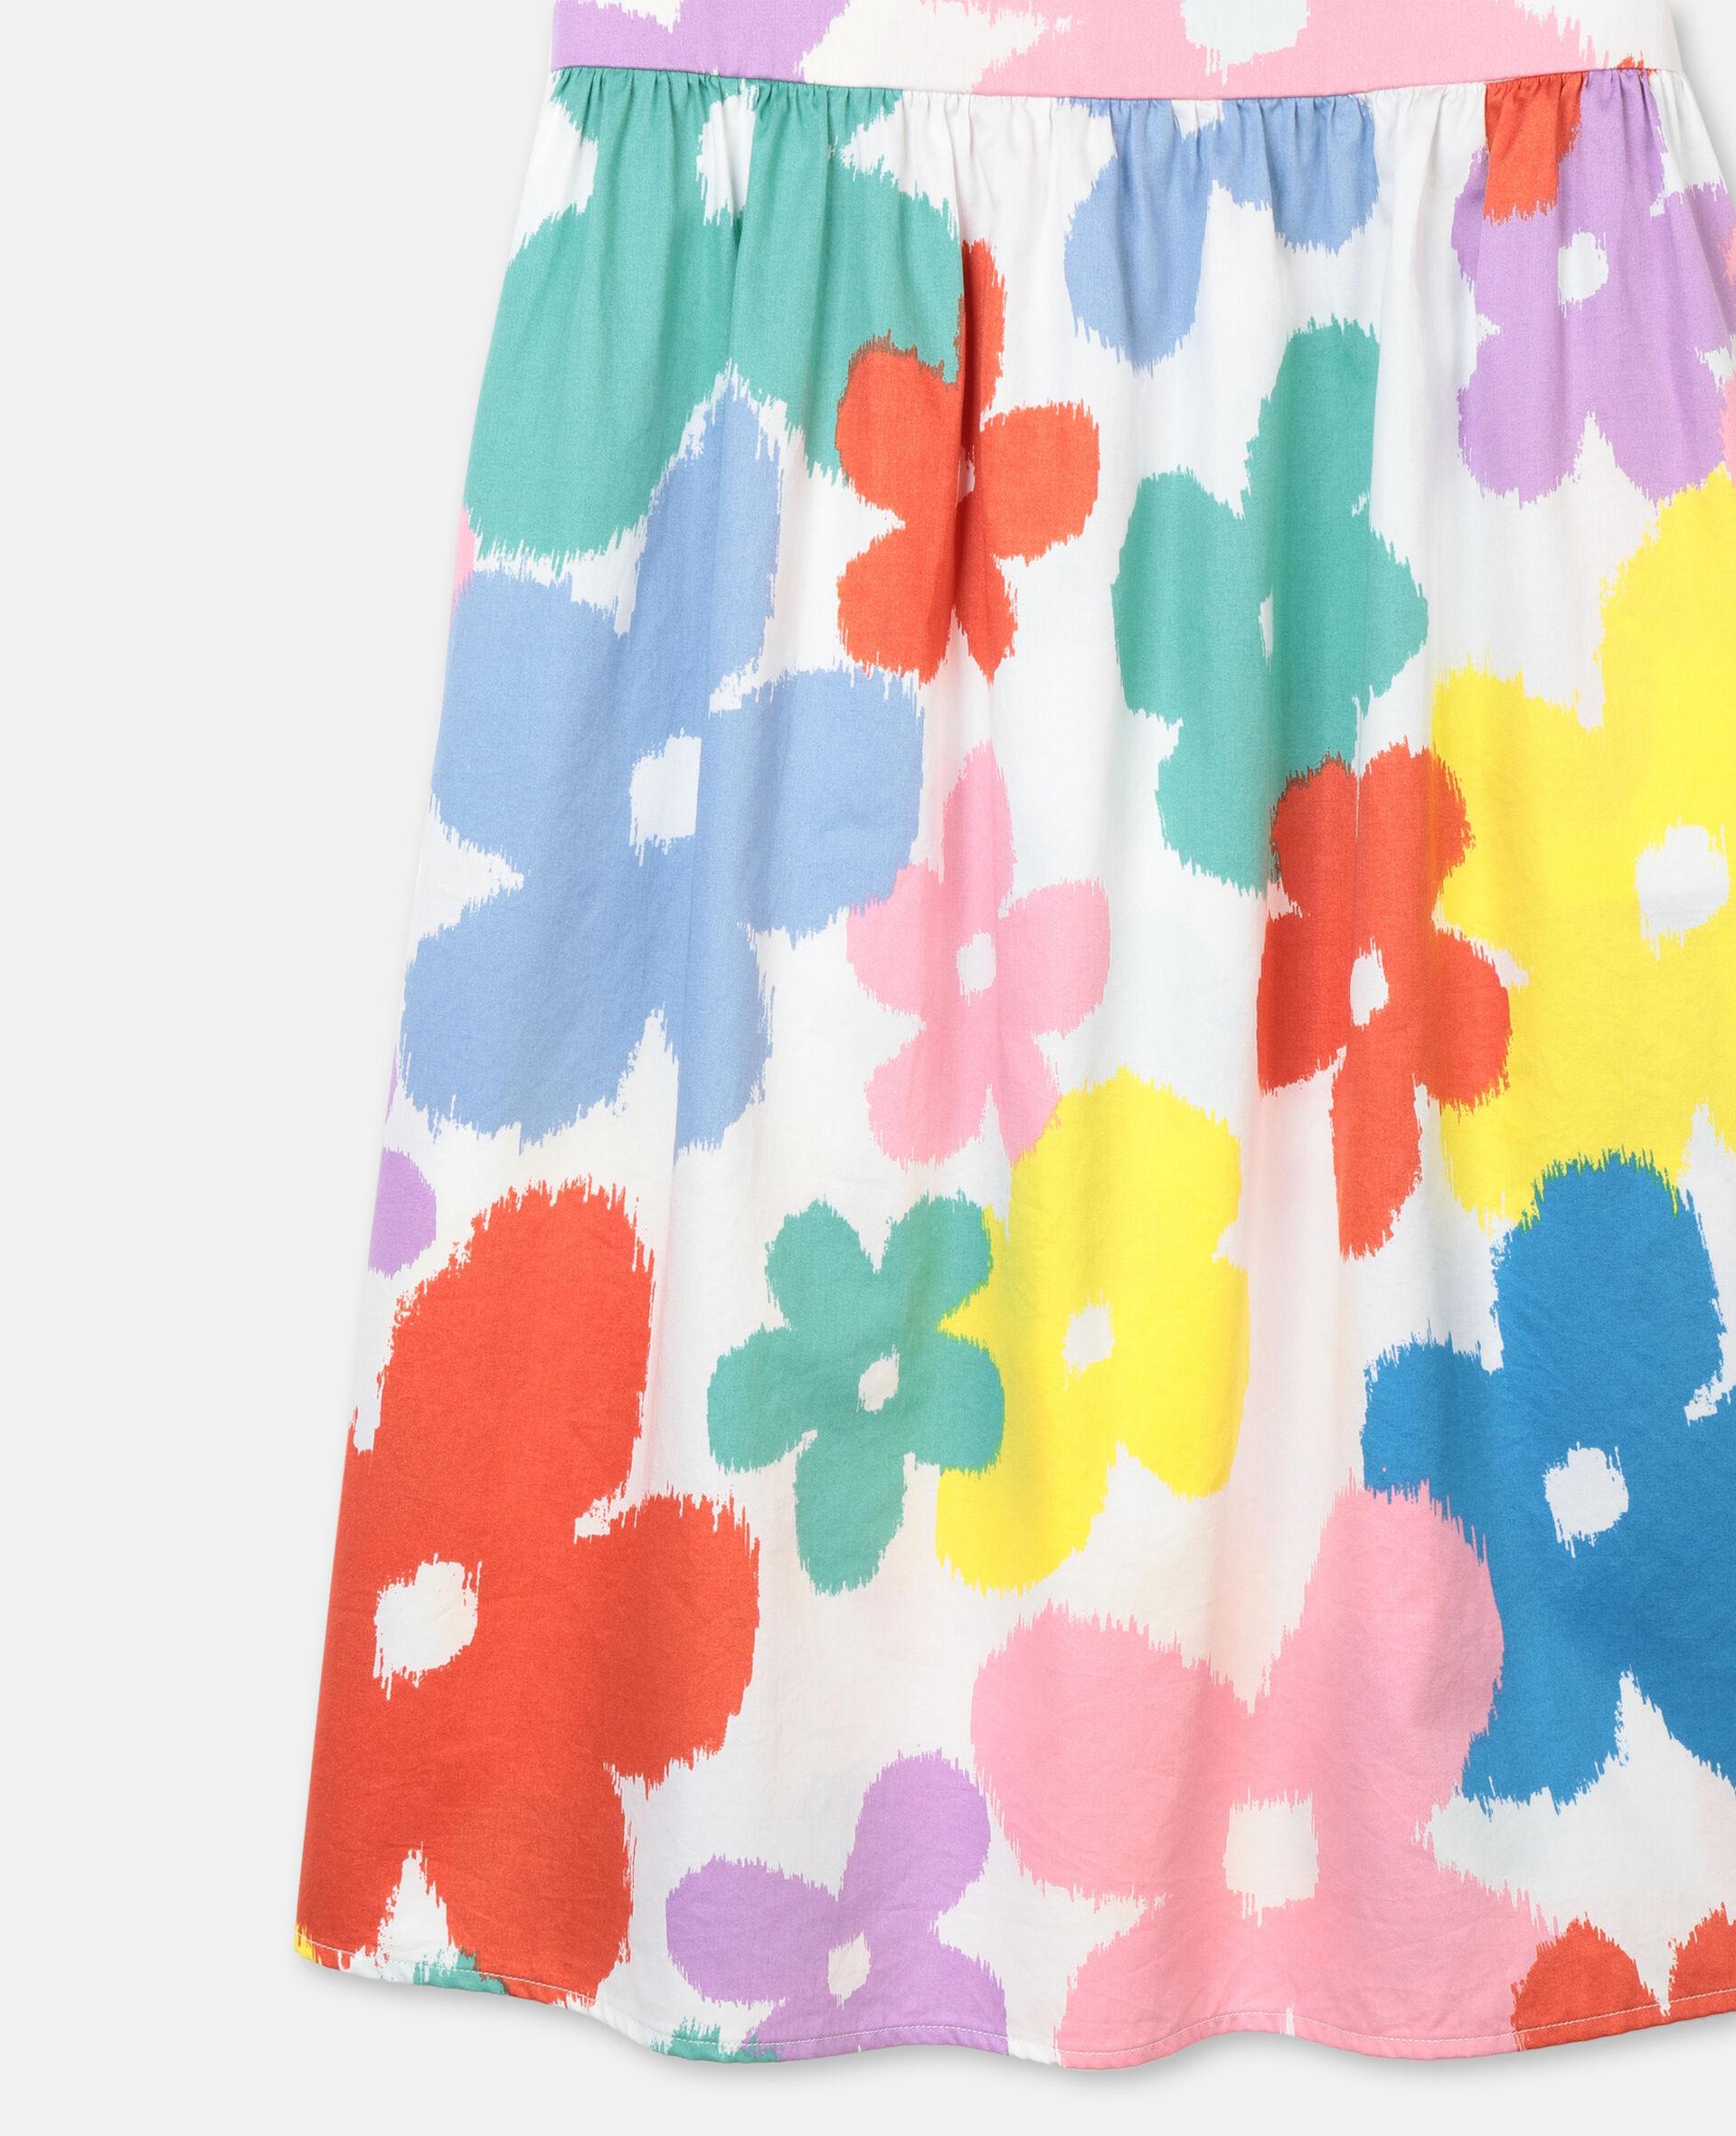 Baumwollkleid mit Blumen-Bunt-large image number 1